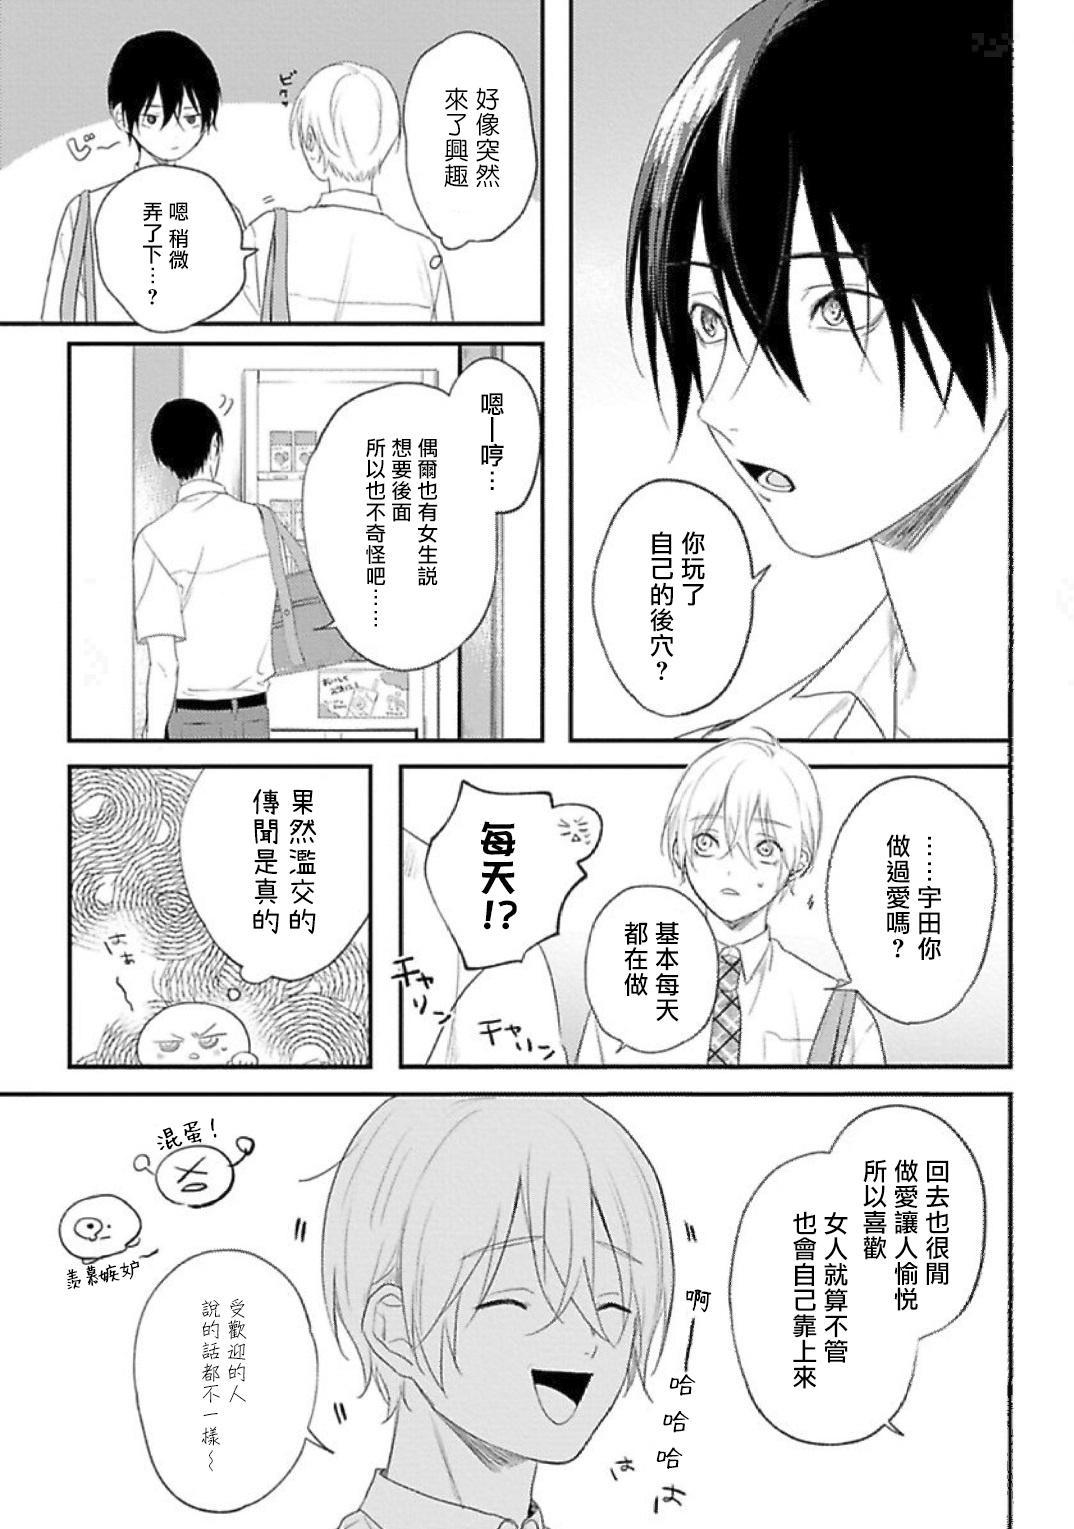 [Utata Hakuto] Houkago Virginity - Virginity afterschool 1-3 [Chinese] [拾荒者汉化组] [Digital] 18